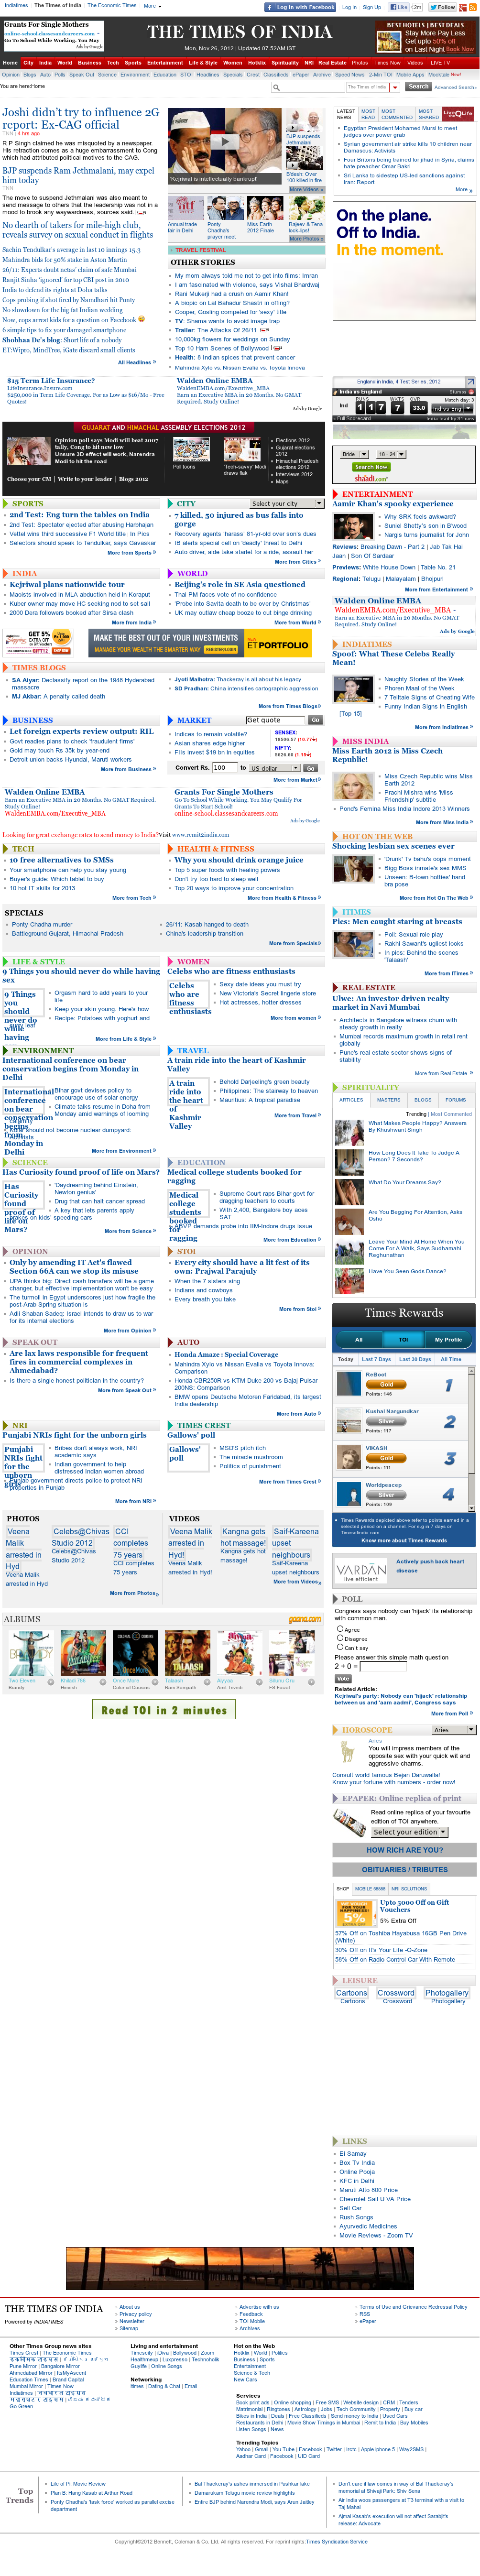 The Times of India at Monday Nov. 26, 2012, 2:33 a.m. UTC